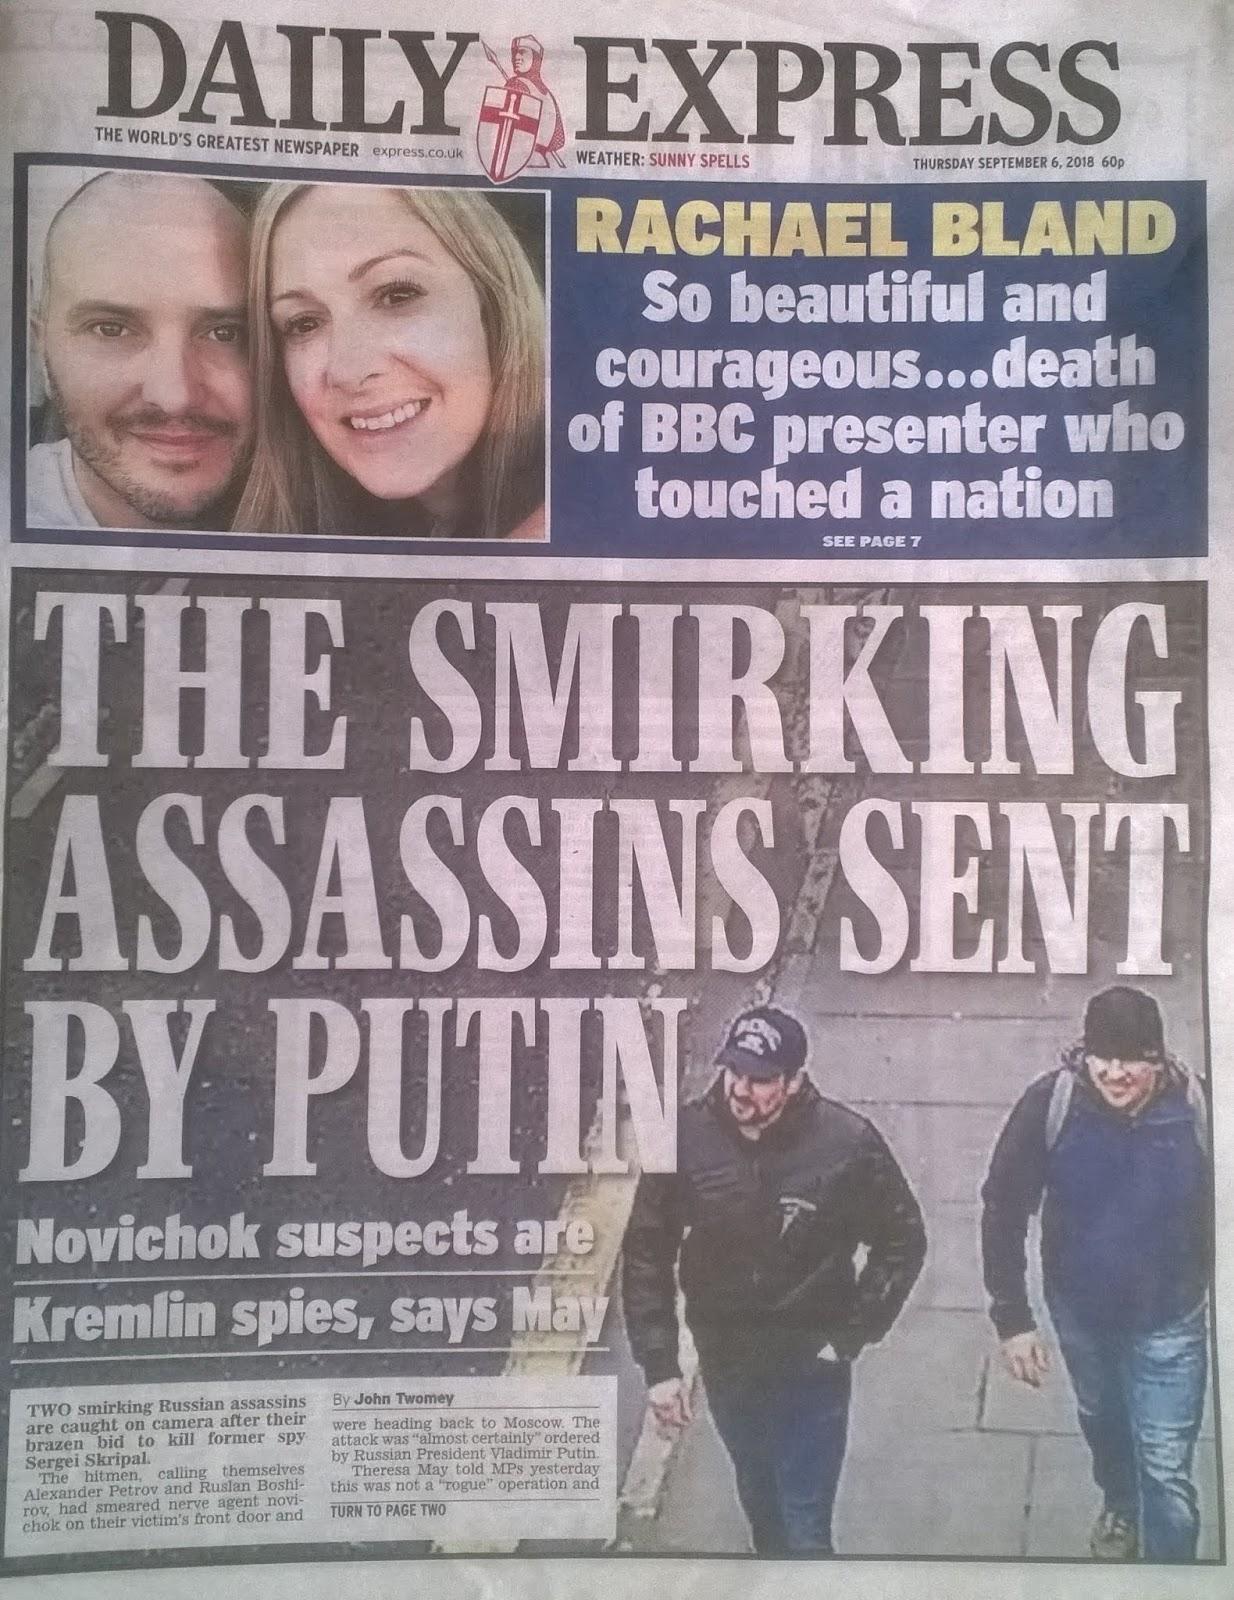 Daily Express 6 September 2018 on Putin GRU Novichok assassins identification.jpg